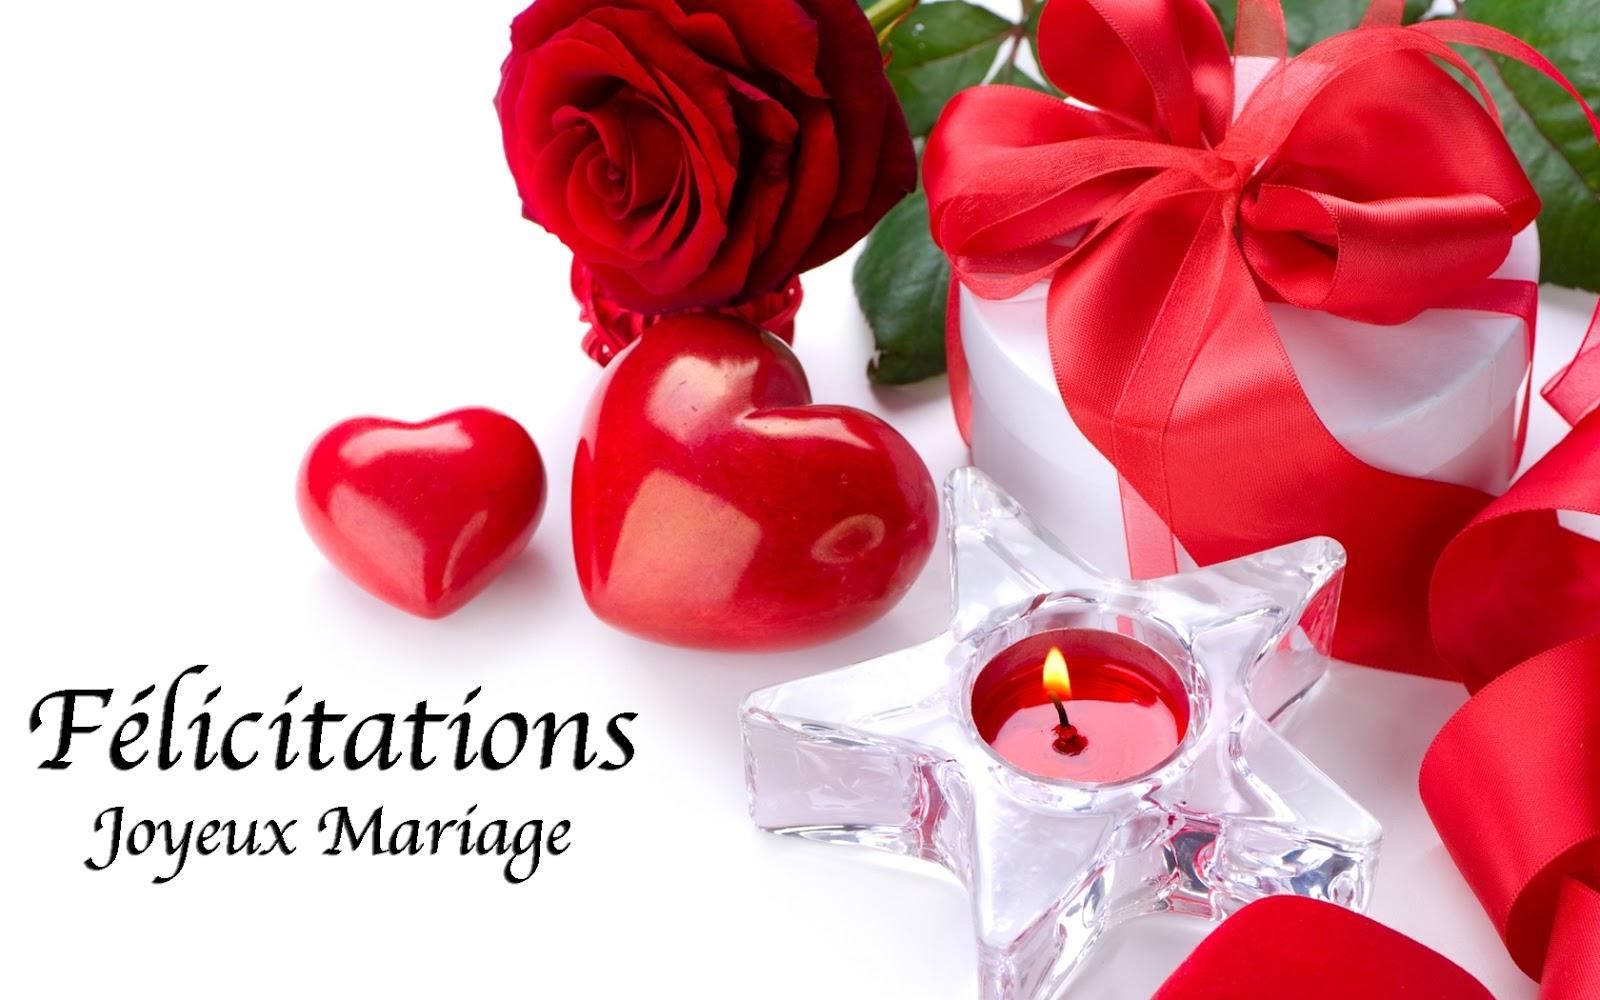 Connu mai 2015 ~ Invitation mariage - Carte mariage - Texte mariage  YW61